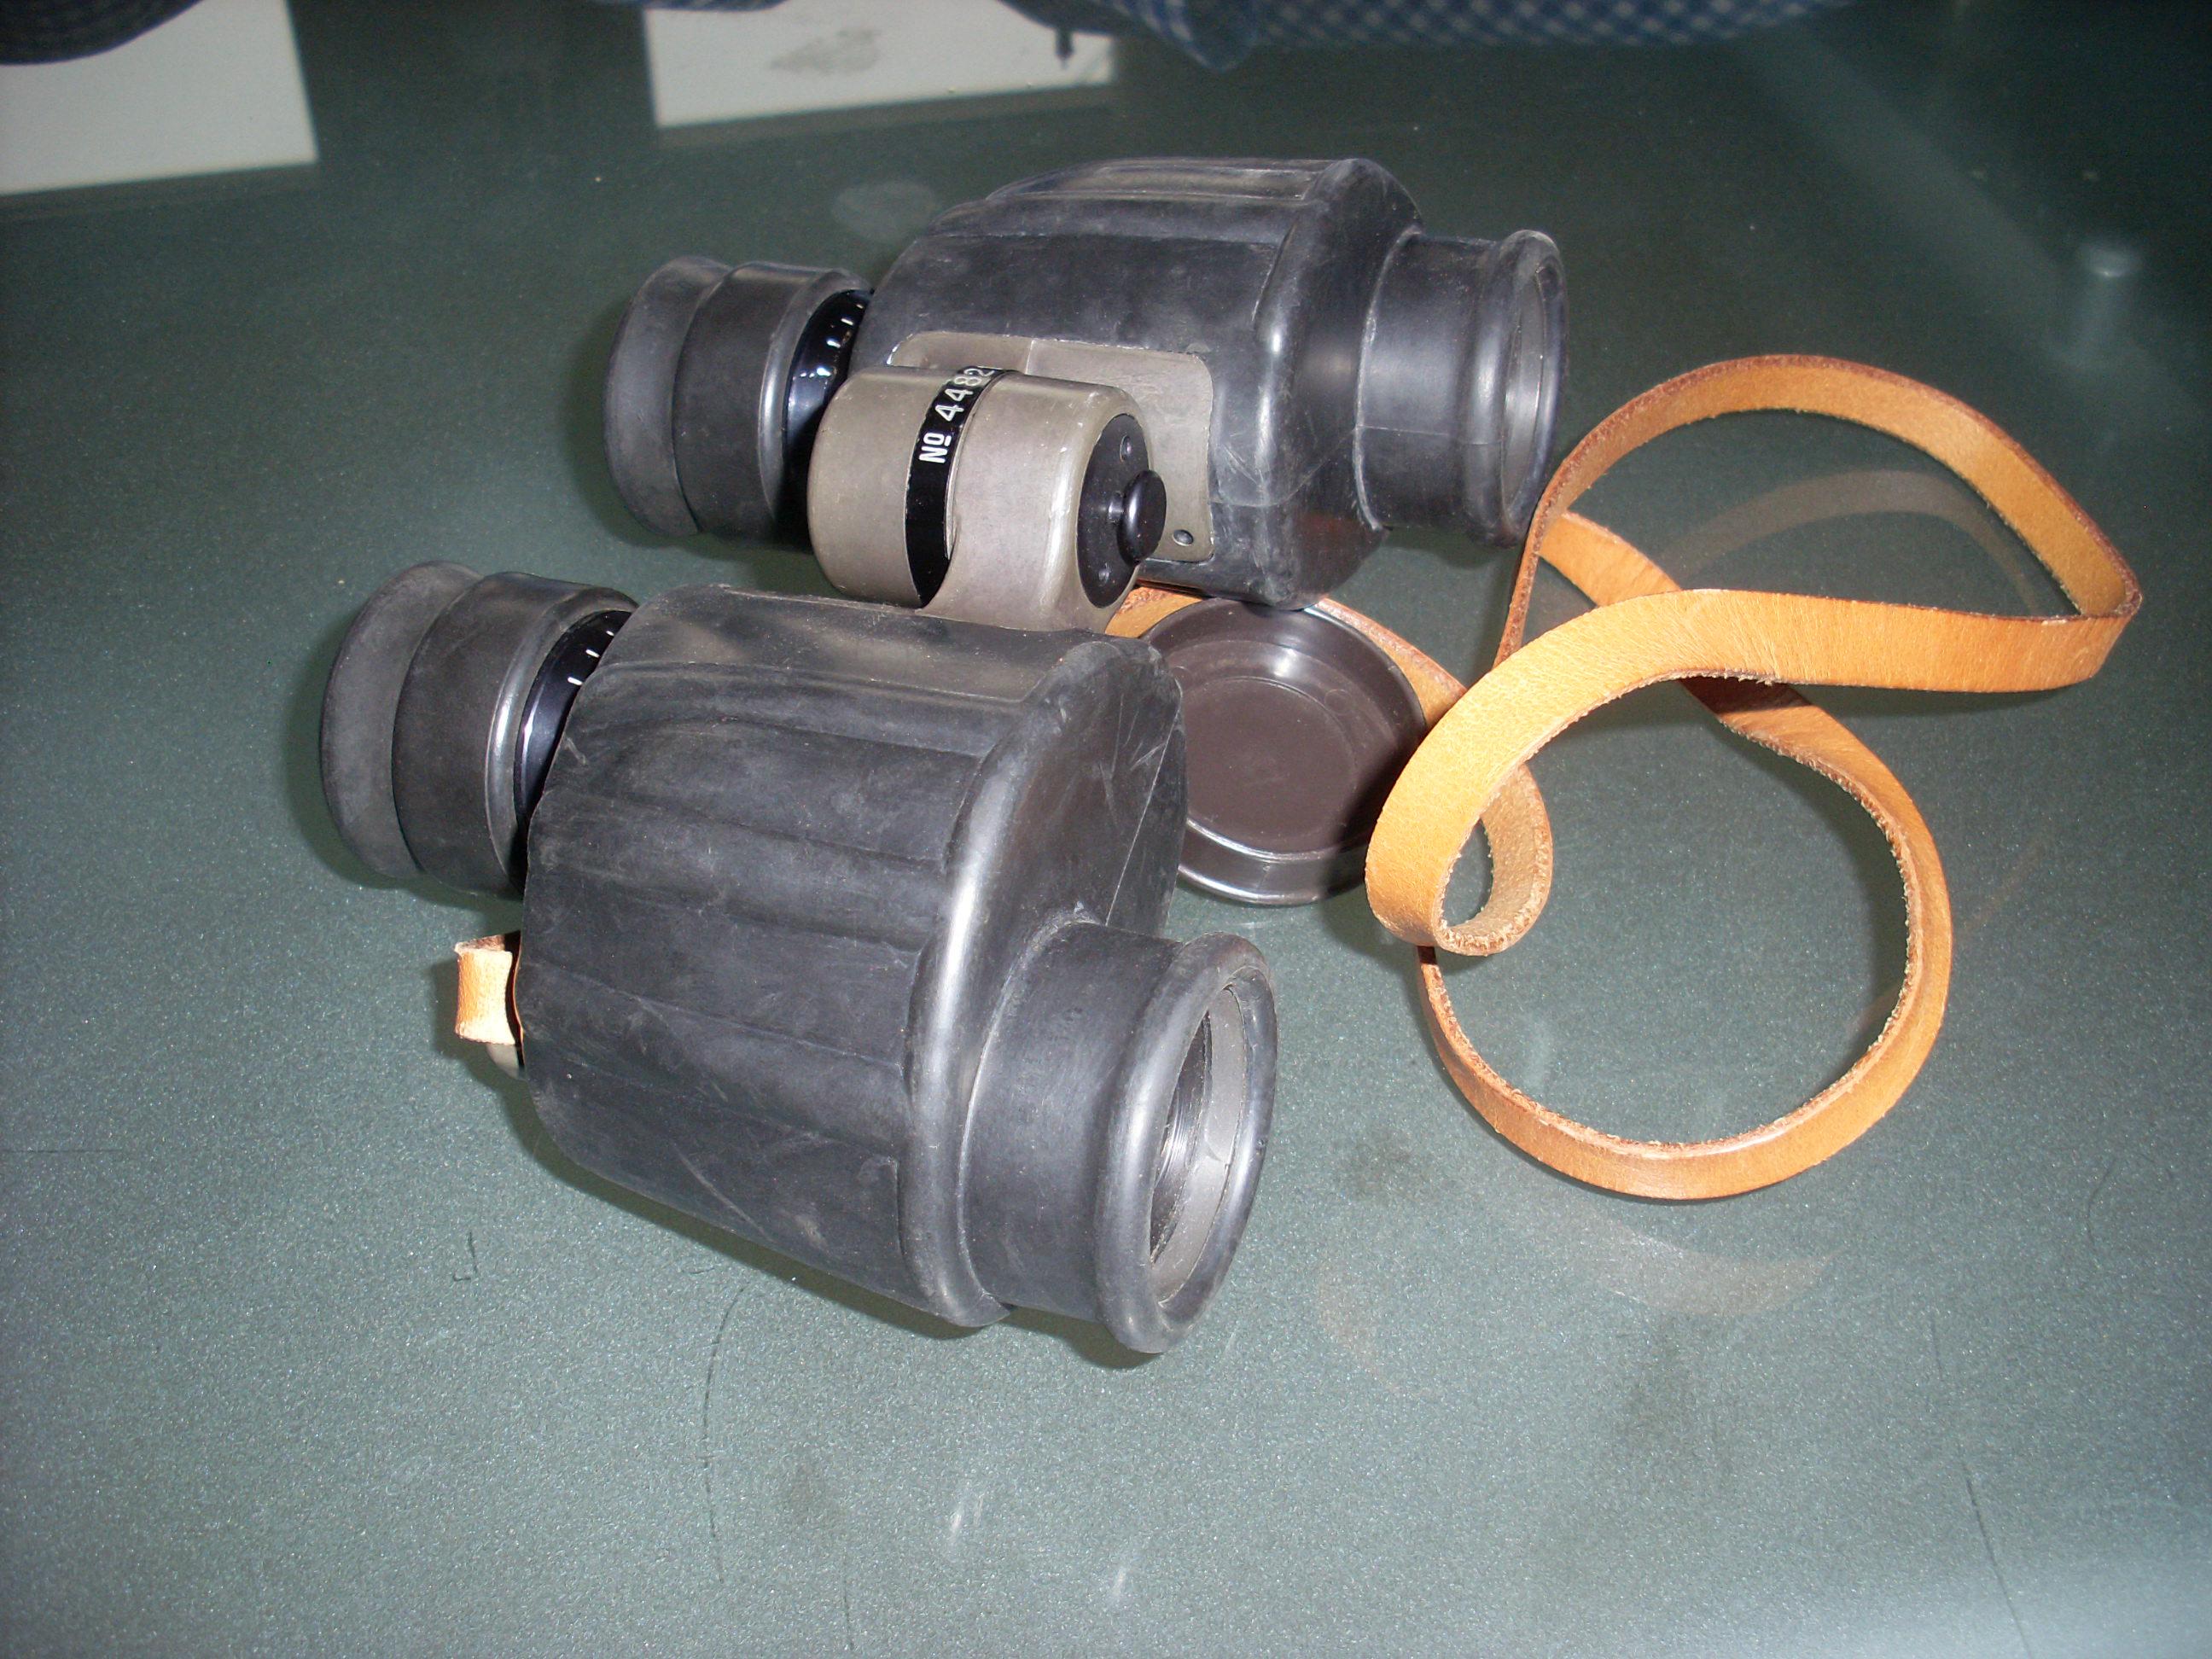 Leica 8x30 swiss army fernglas s.g.